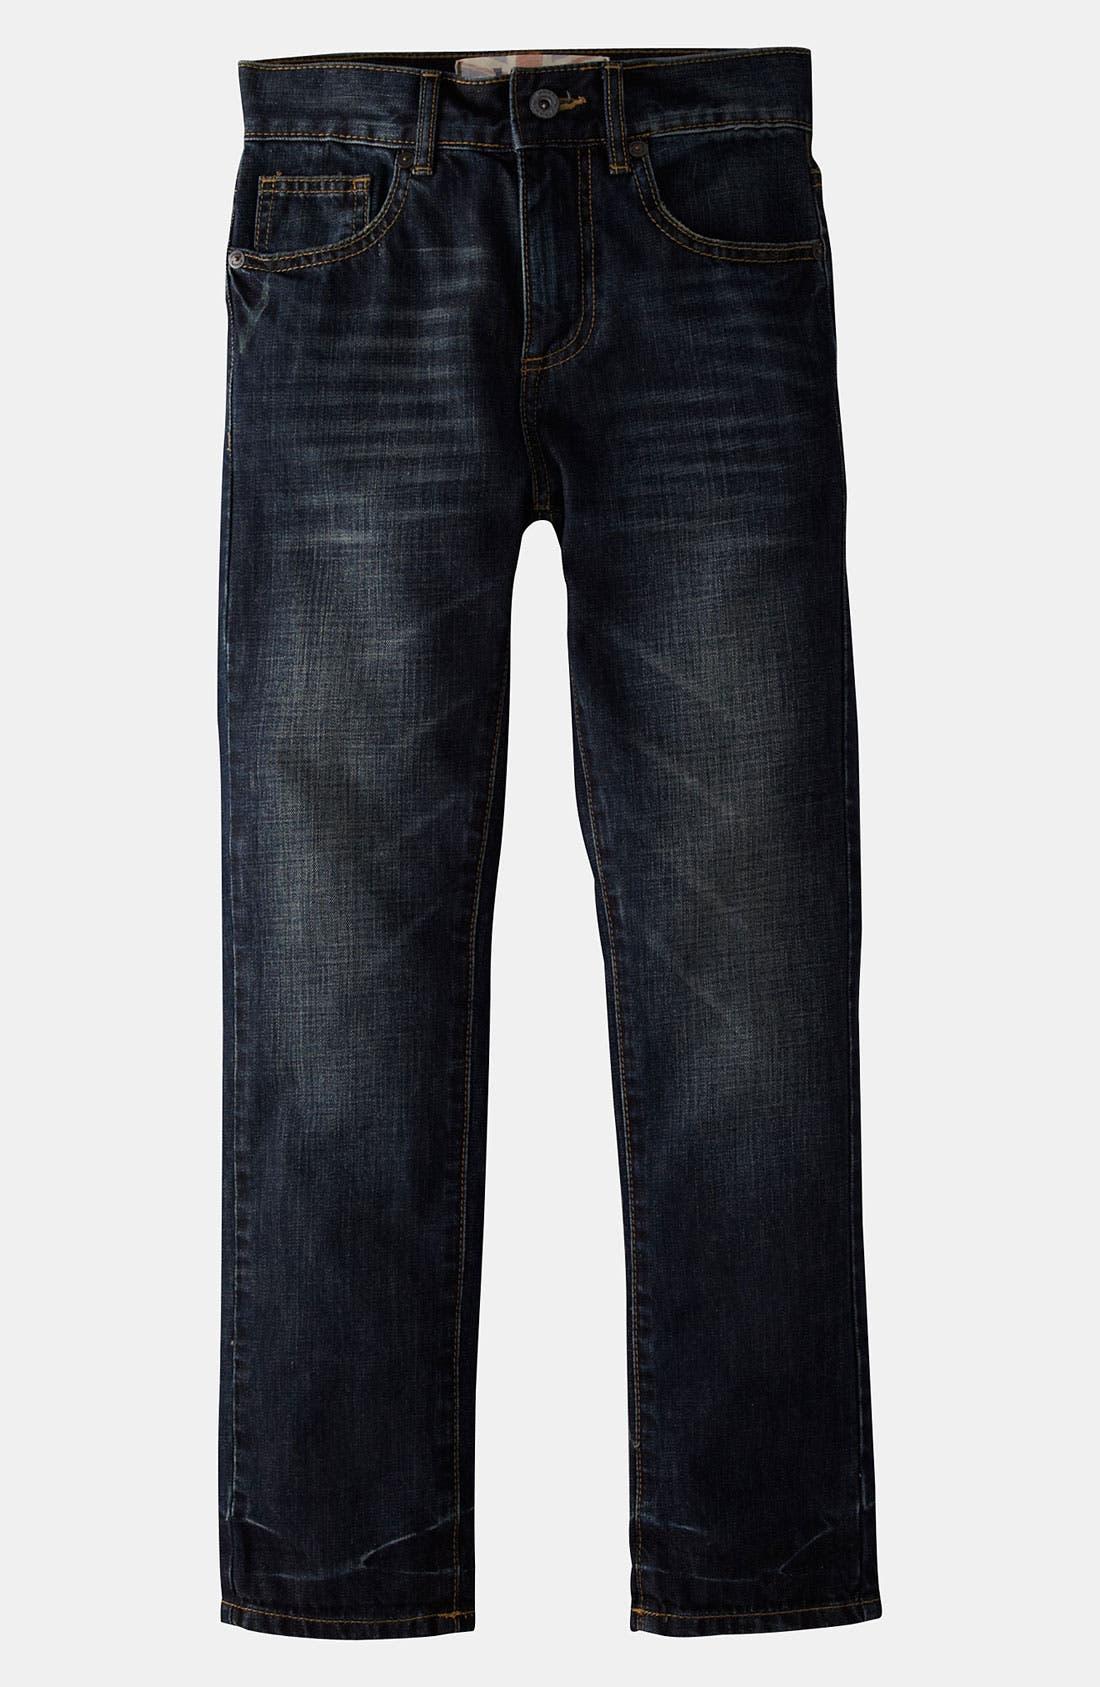 Main Image - Johnnie b Slim Fit Pants (Big Boys)